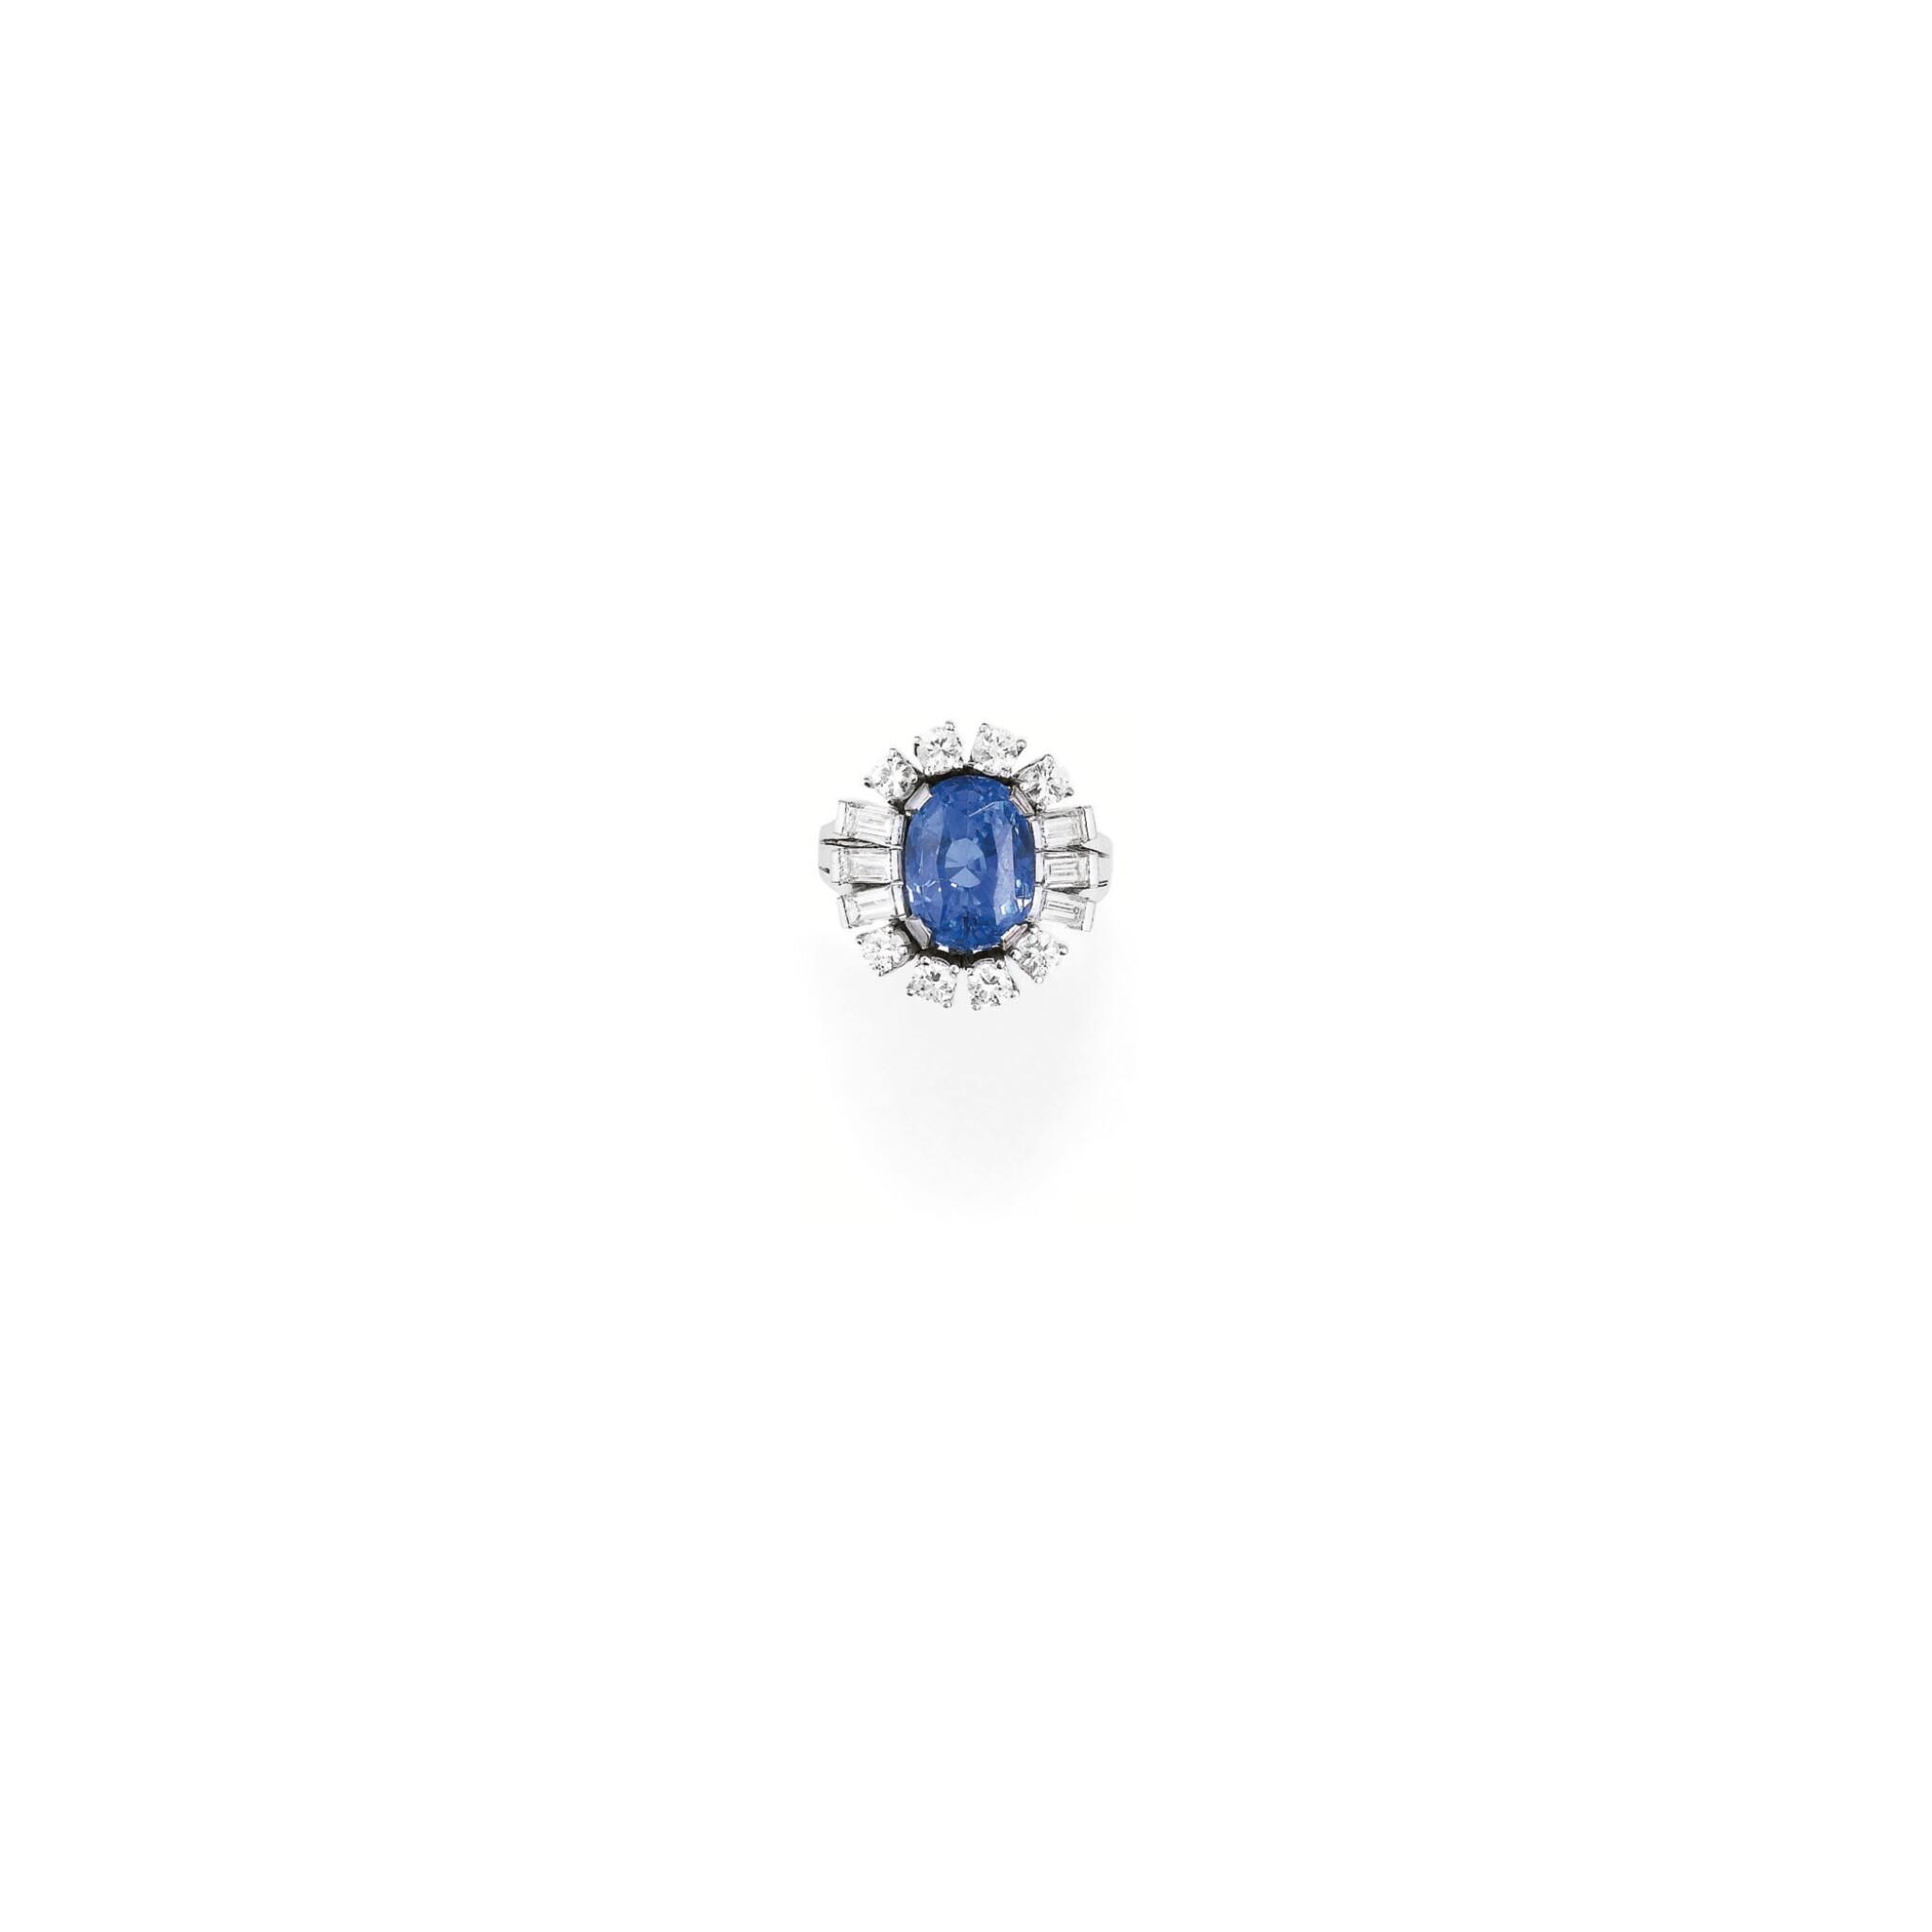 View 1 of Lot 227. BAGUE SAPHIR ET DIAMANTS | SAPPHIRE AND DIAMOND RING.